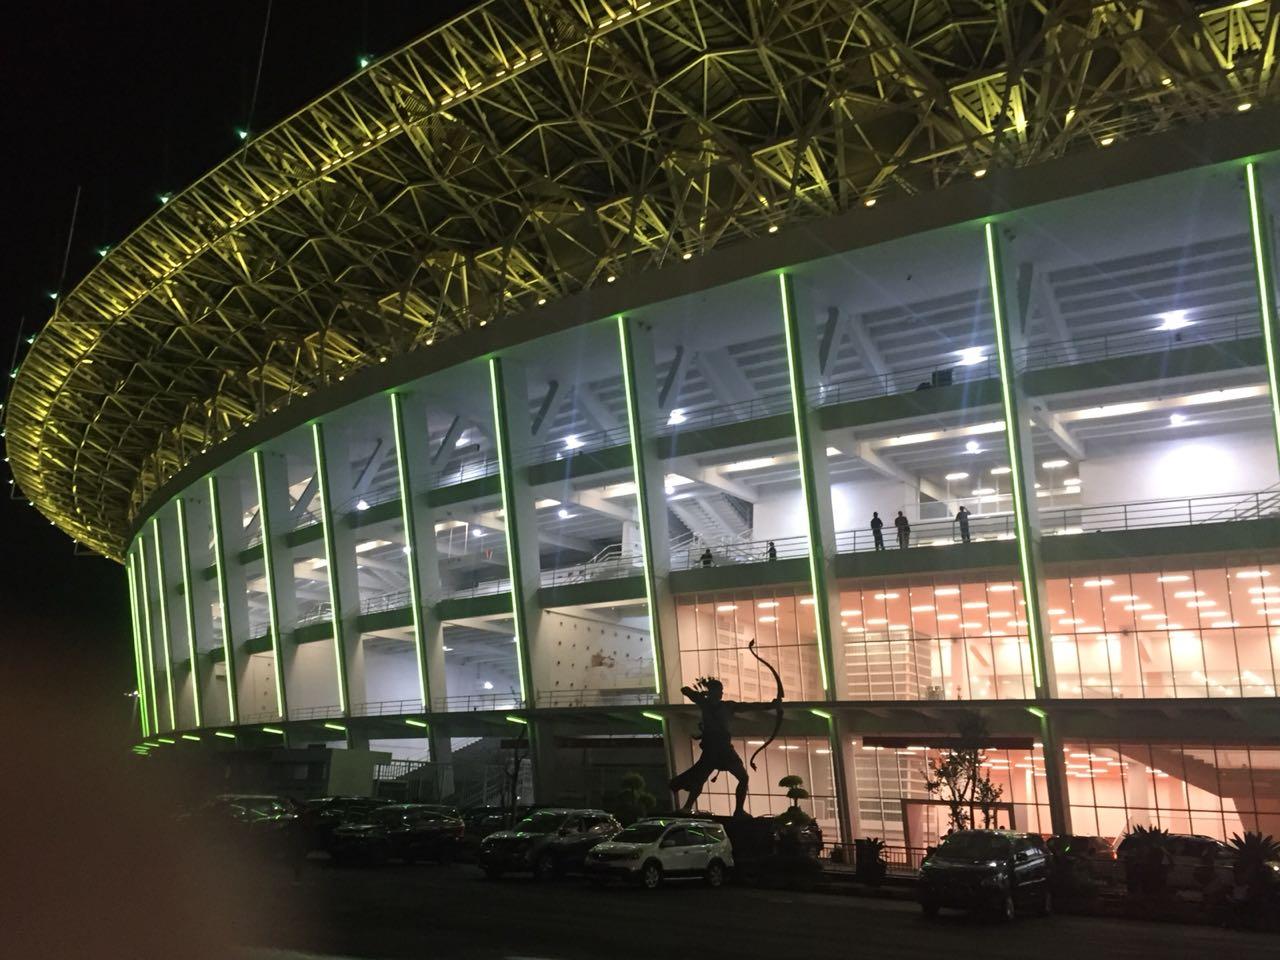 https: img-z.okeinfo.net content 2018 01 12 470 1844348 stadion-gelora-bung-karno-direnovasi-warga-jakarta-harus-merawatnya-fOEbwS4NML.jpg